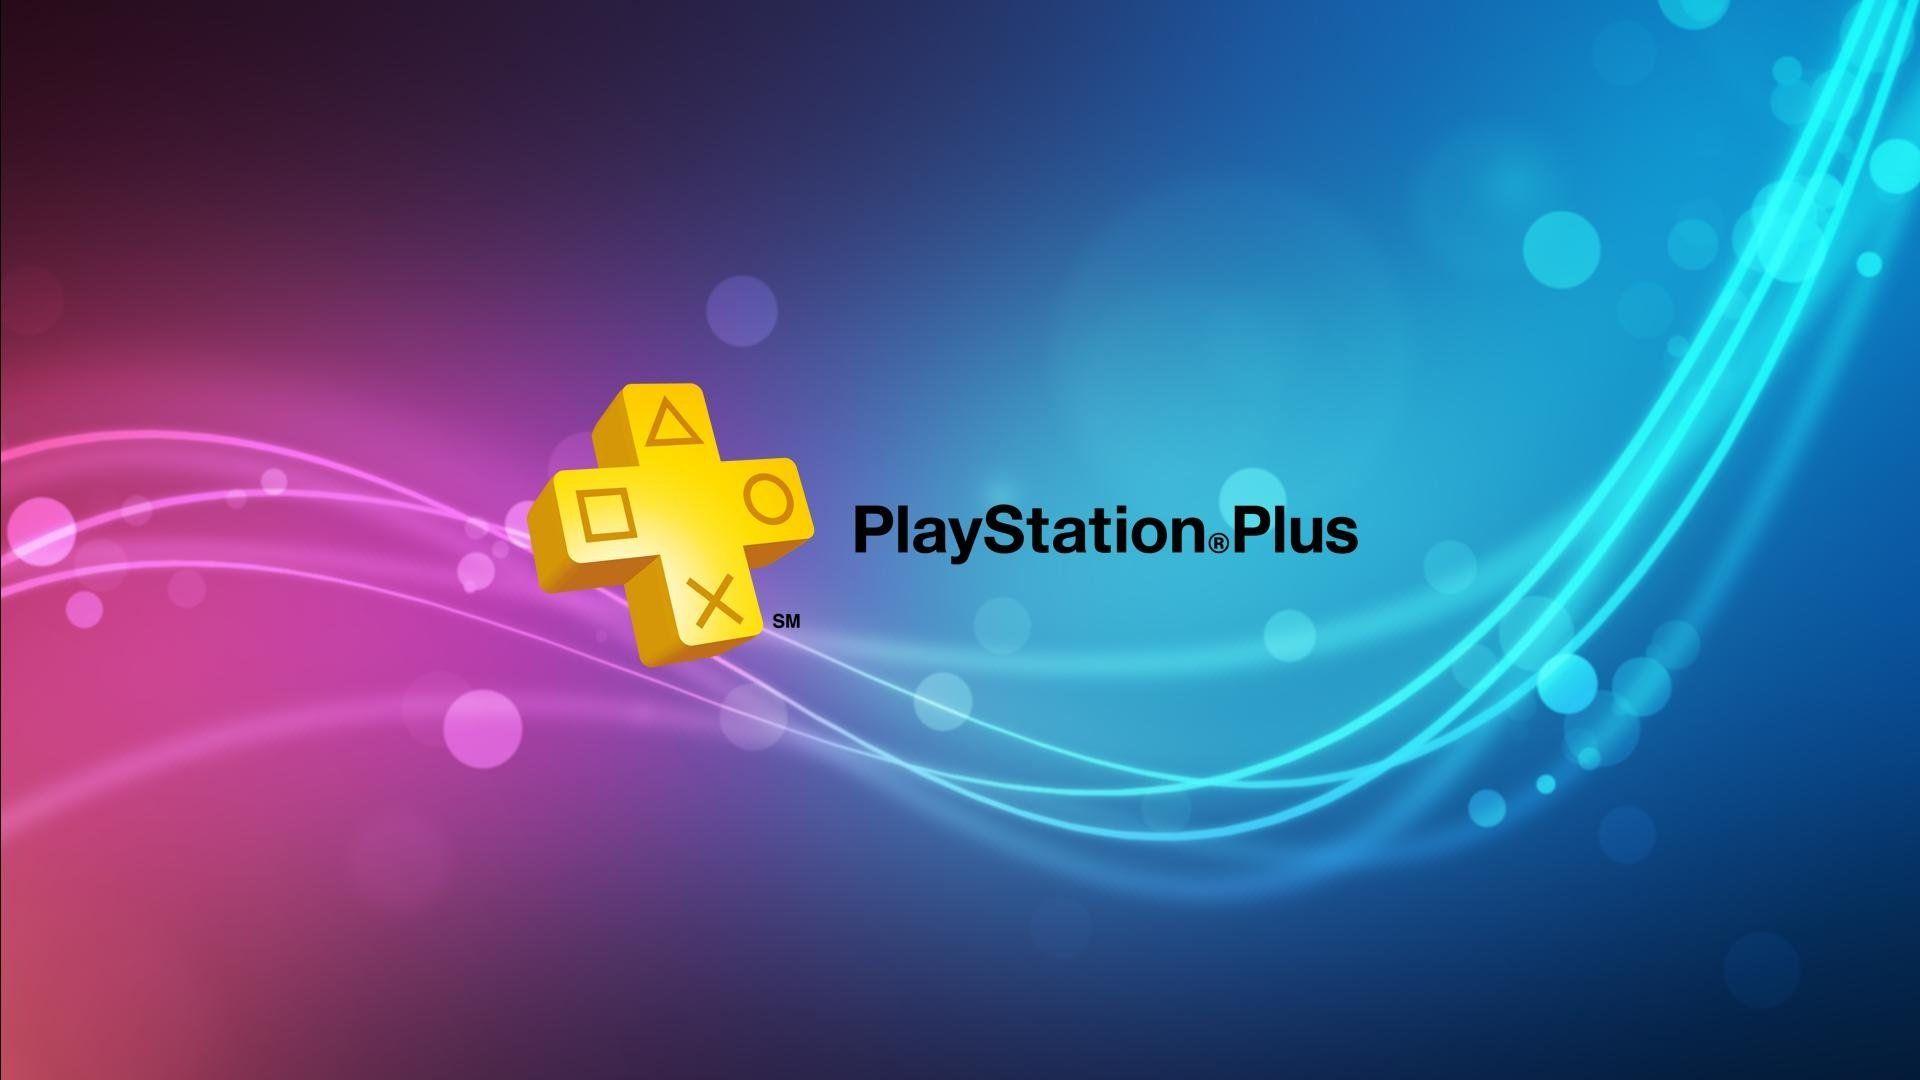 PlayStation Plus Logo Artwork